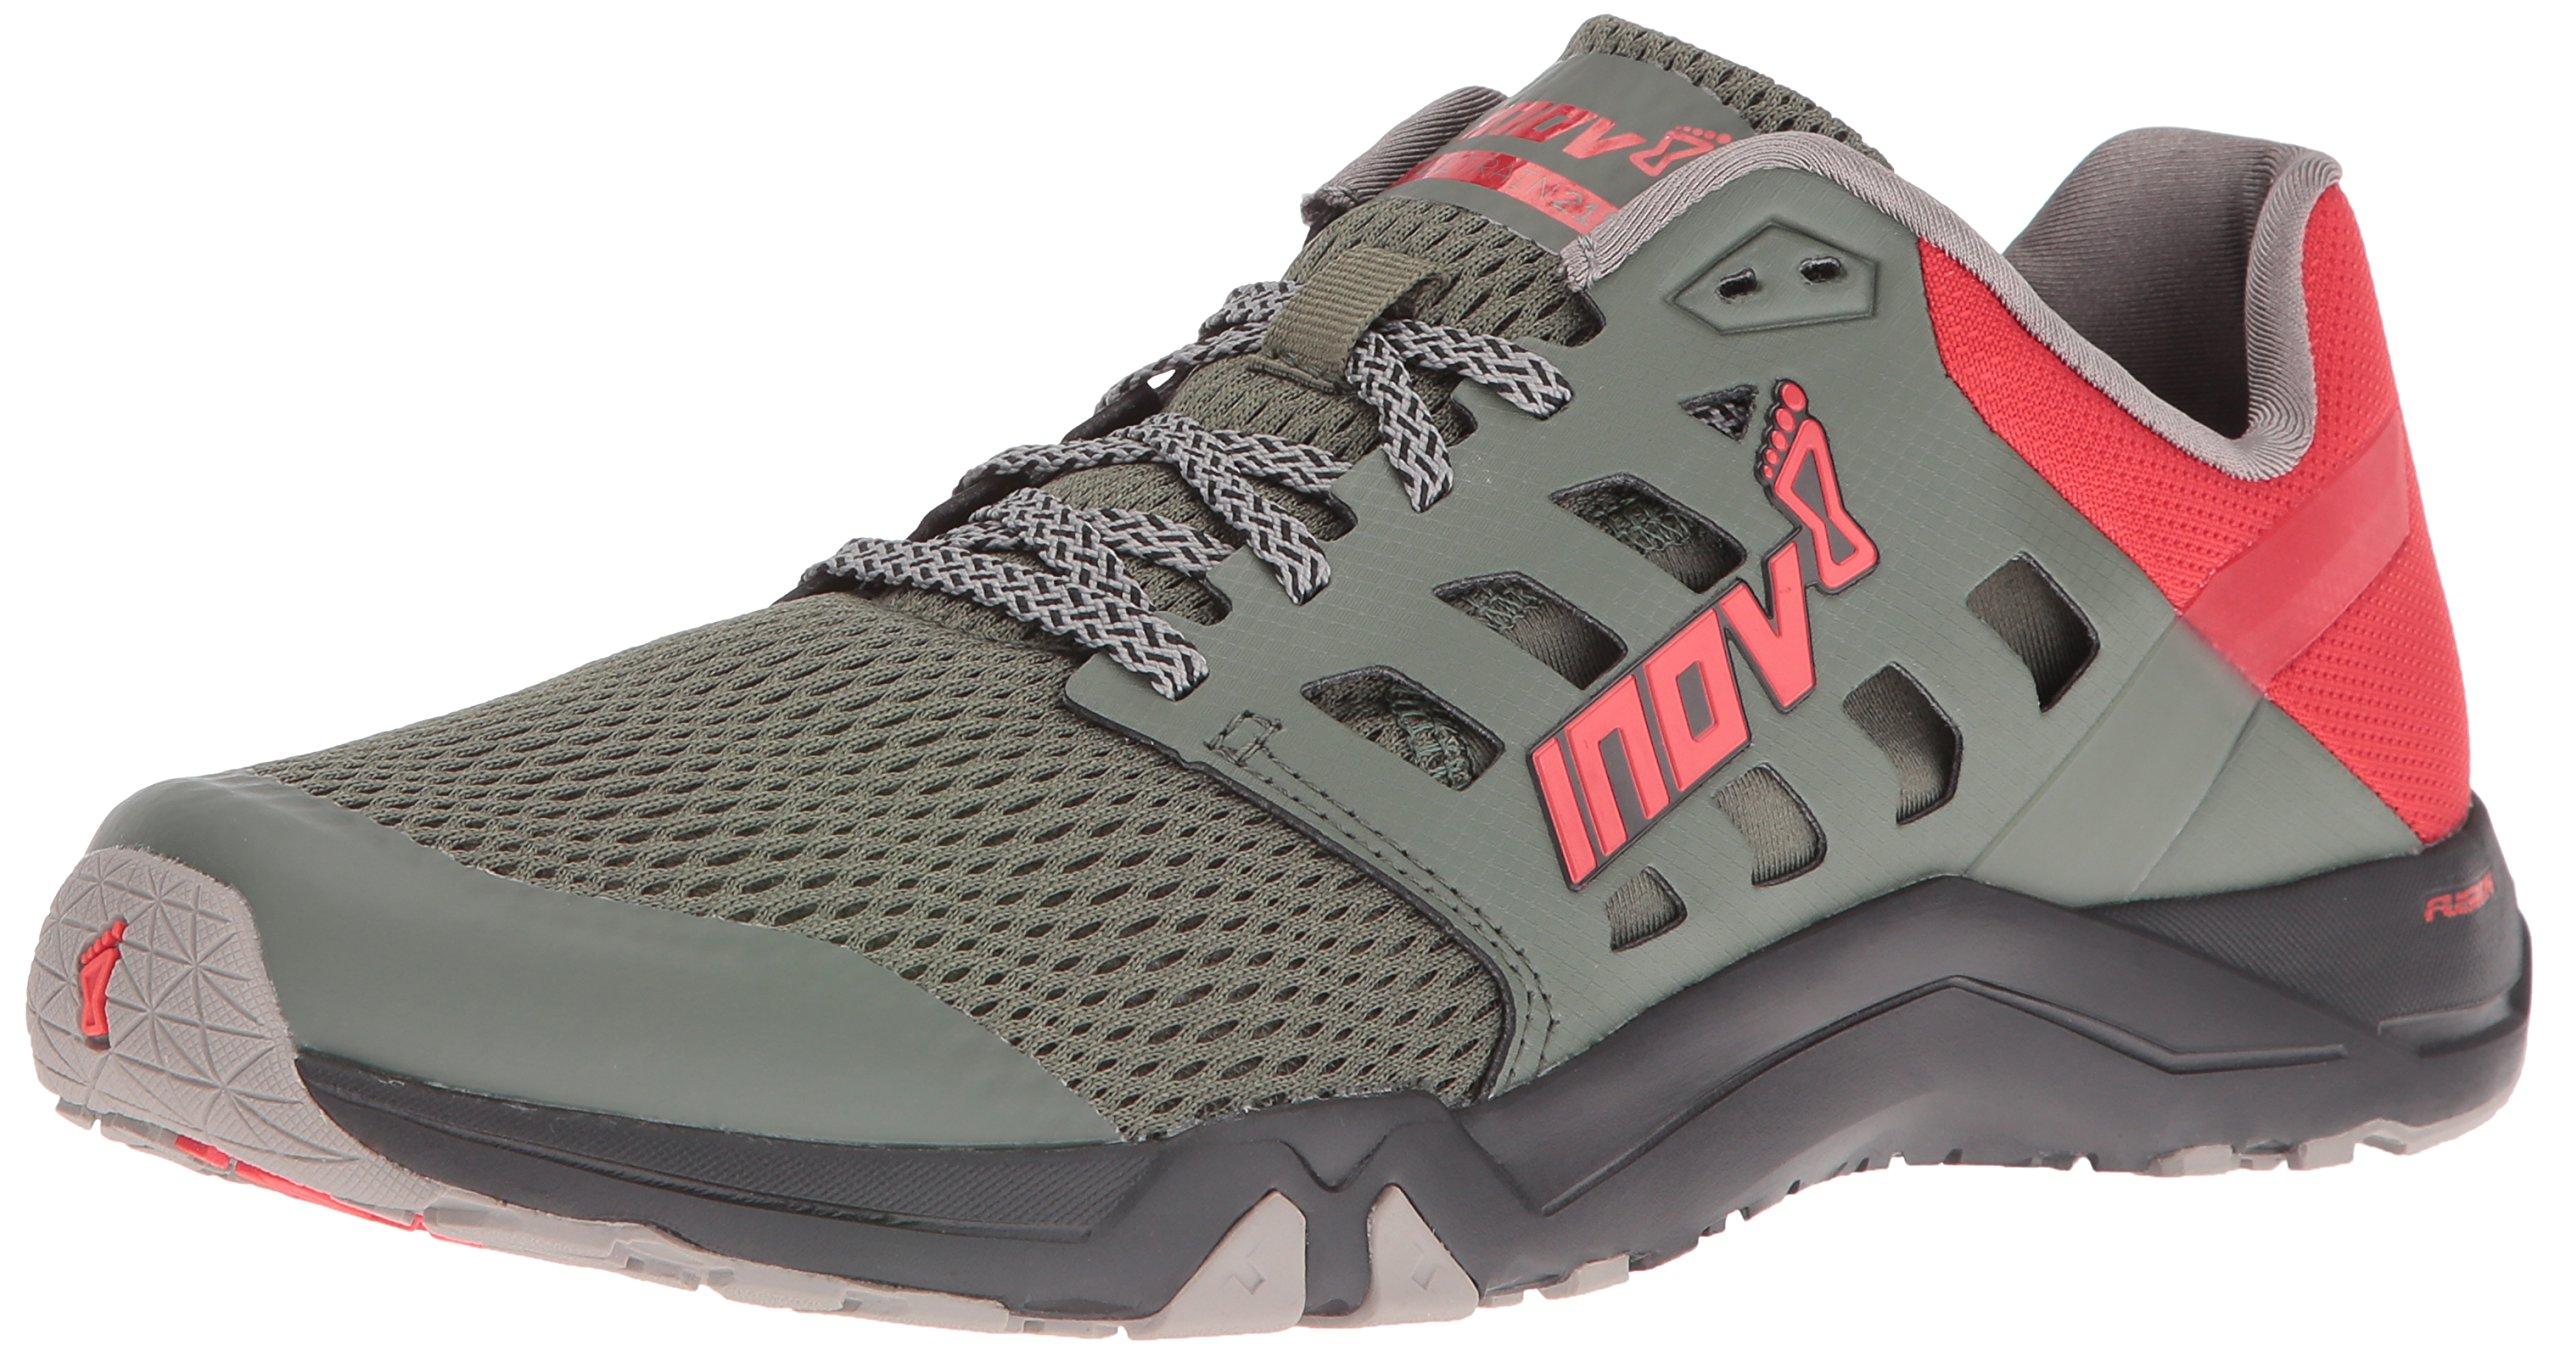 Inov-8 Men's All Train 215 Cross-Trainer Shoe, Dark Green/Red/Black, 11 D US